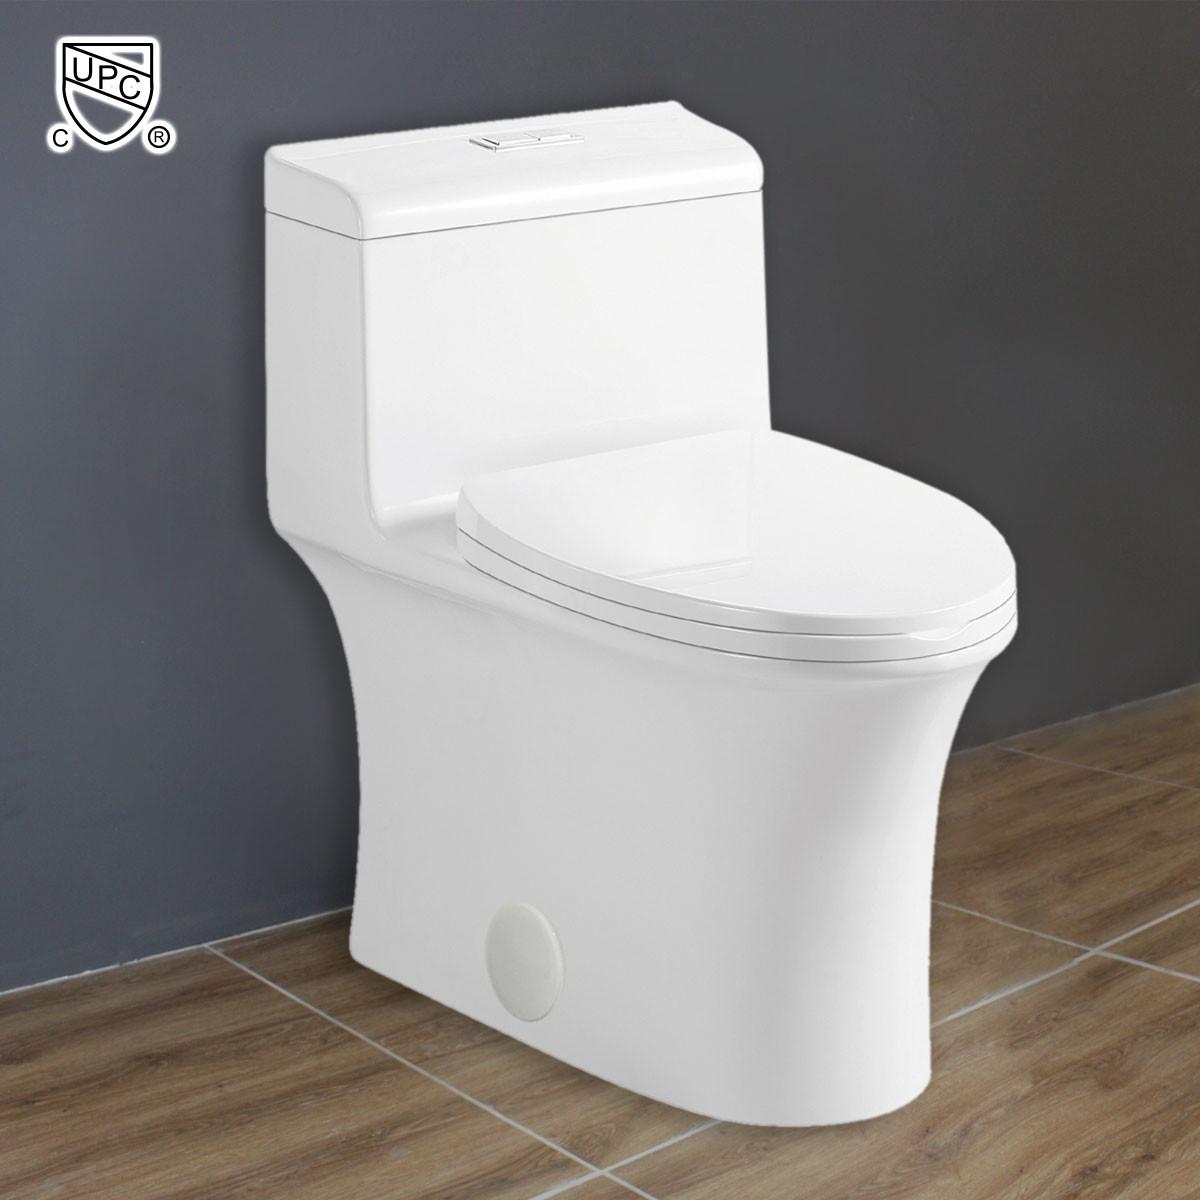 Dual Flush Siphonic Water Saving Ceramic One-piece Toilet (DK-ZBQ-12215)